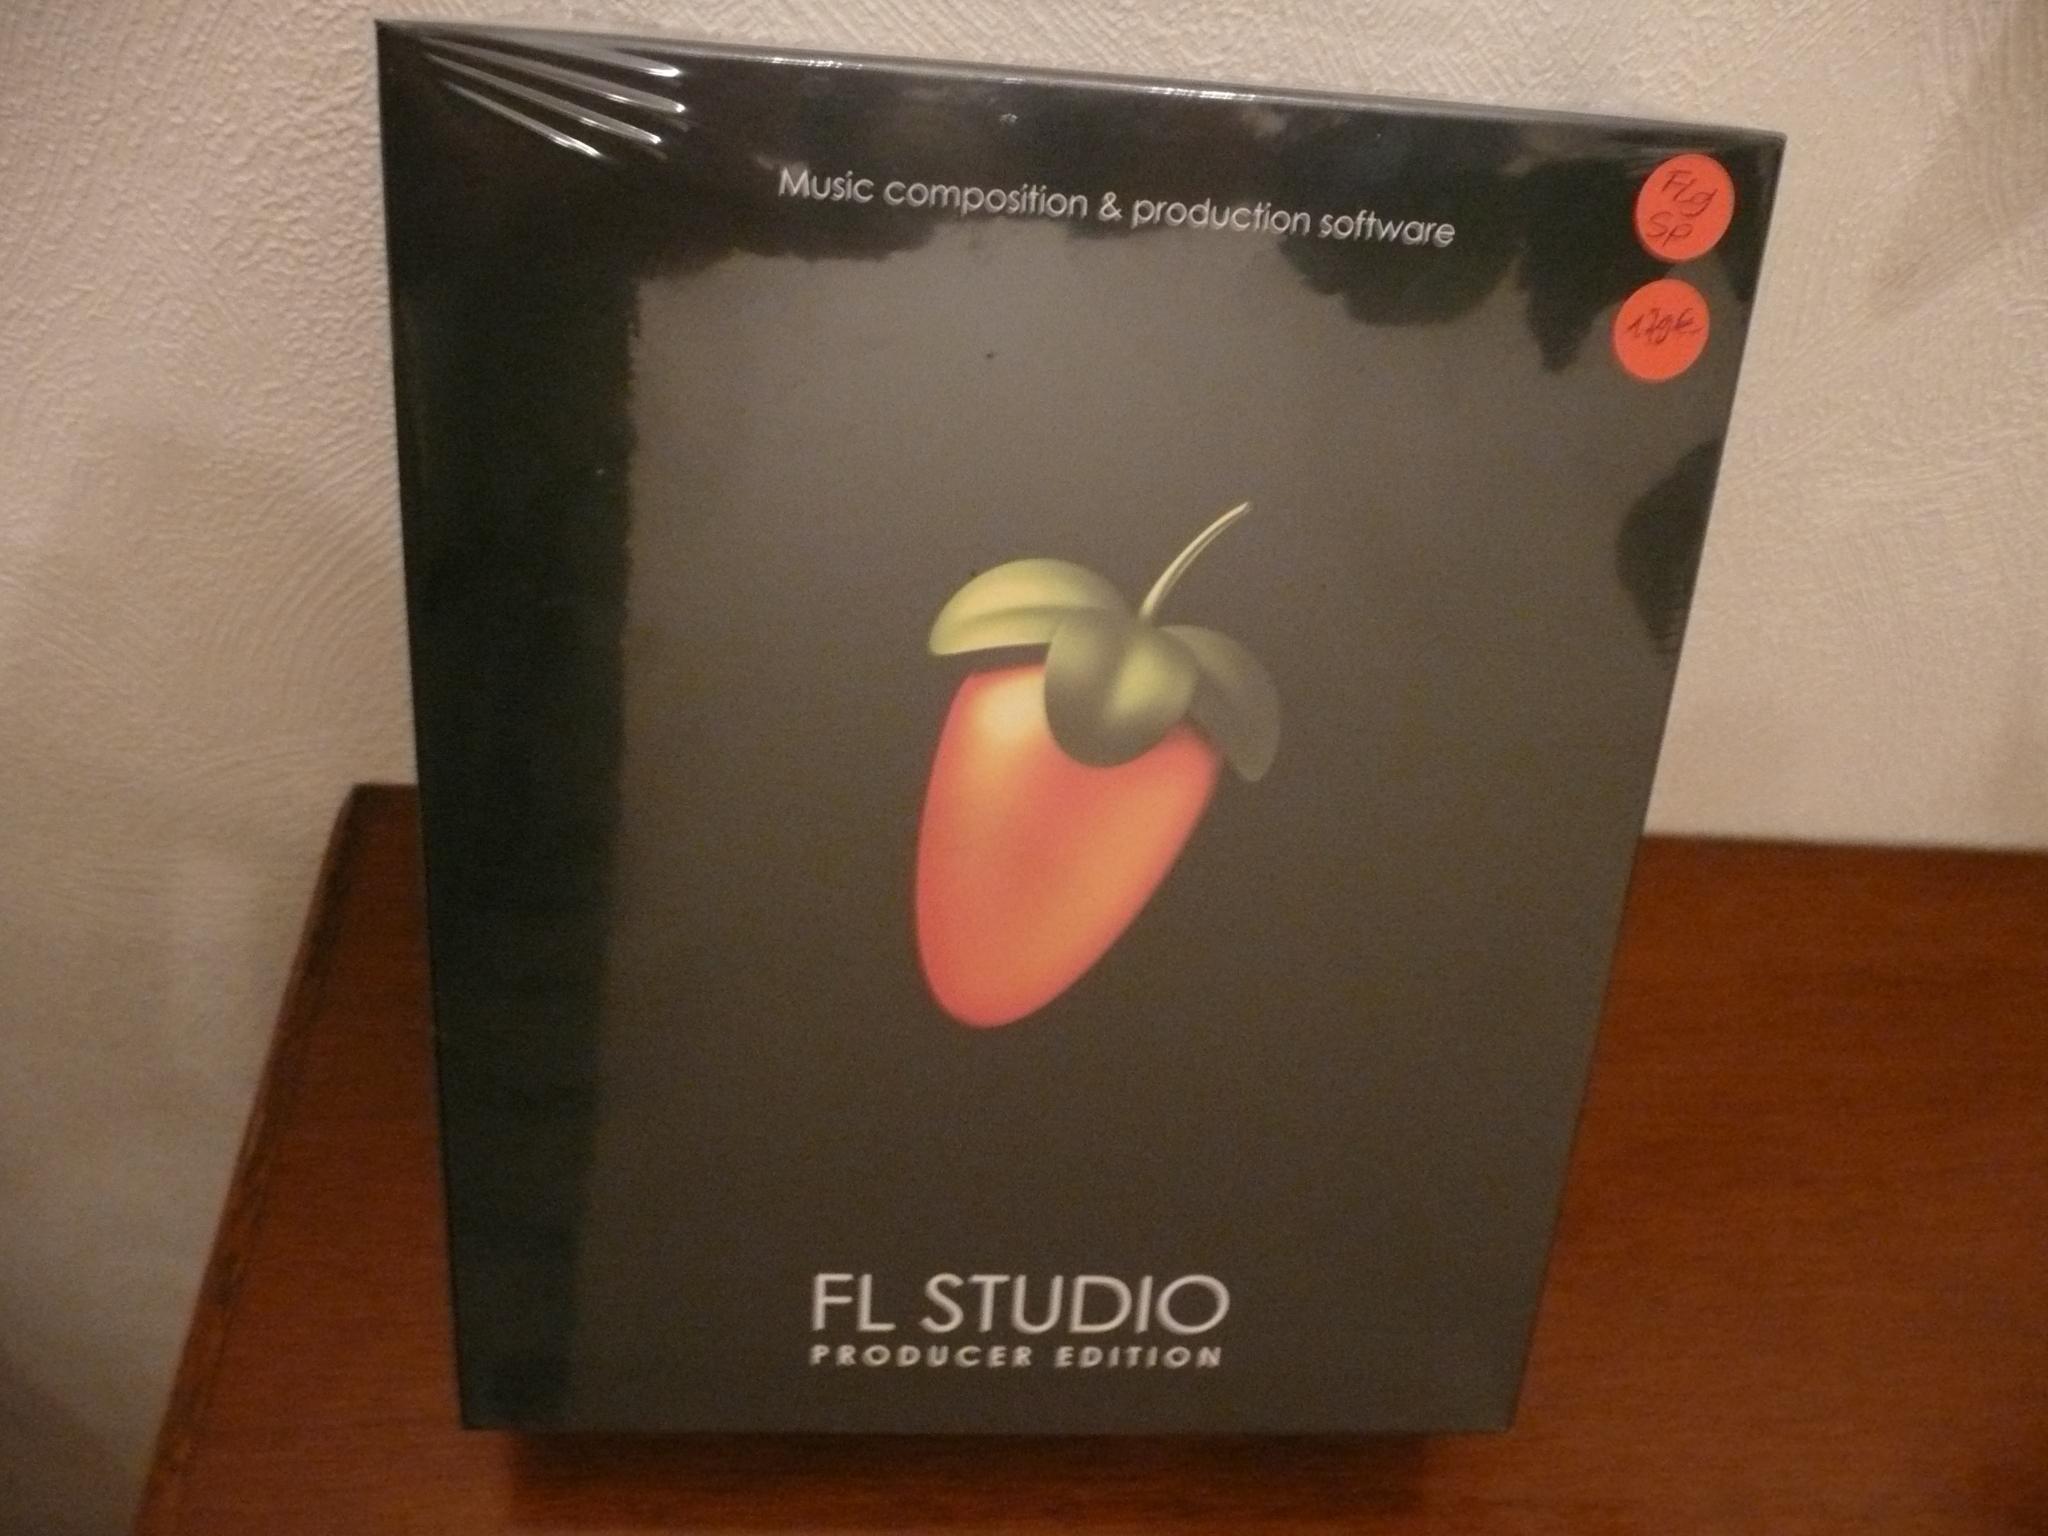 fl studio 9 producer edition